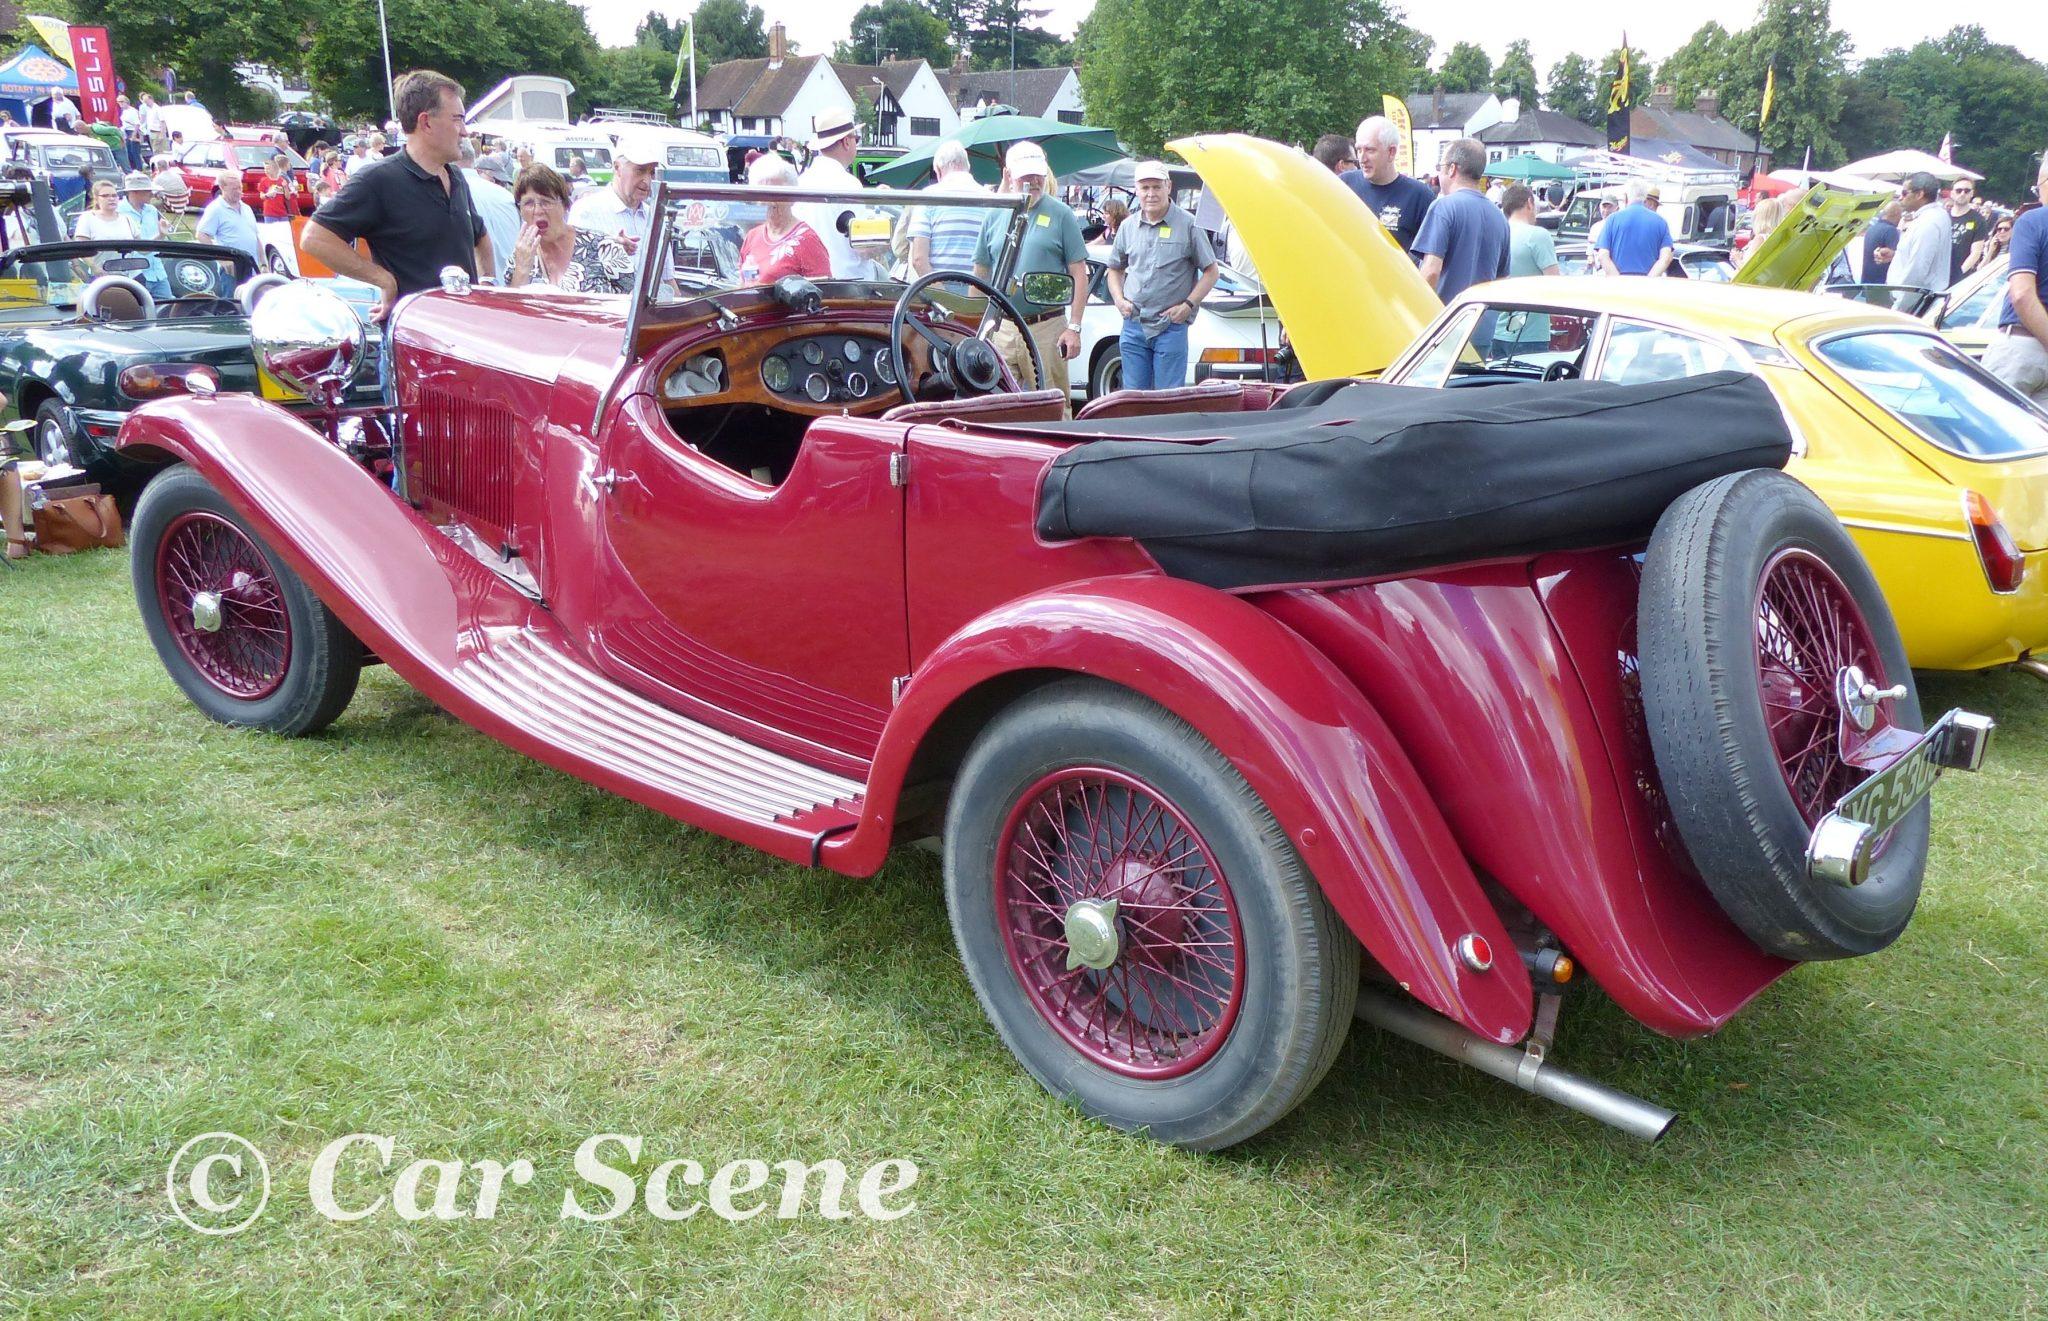 c.1934 Lagonda 4 1/2 Lltr. Tourer rear three quarters view